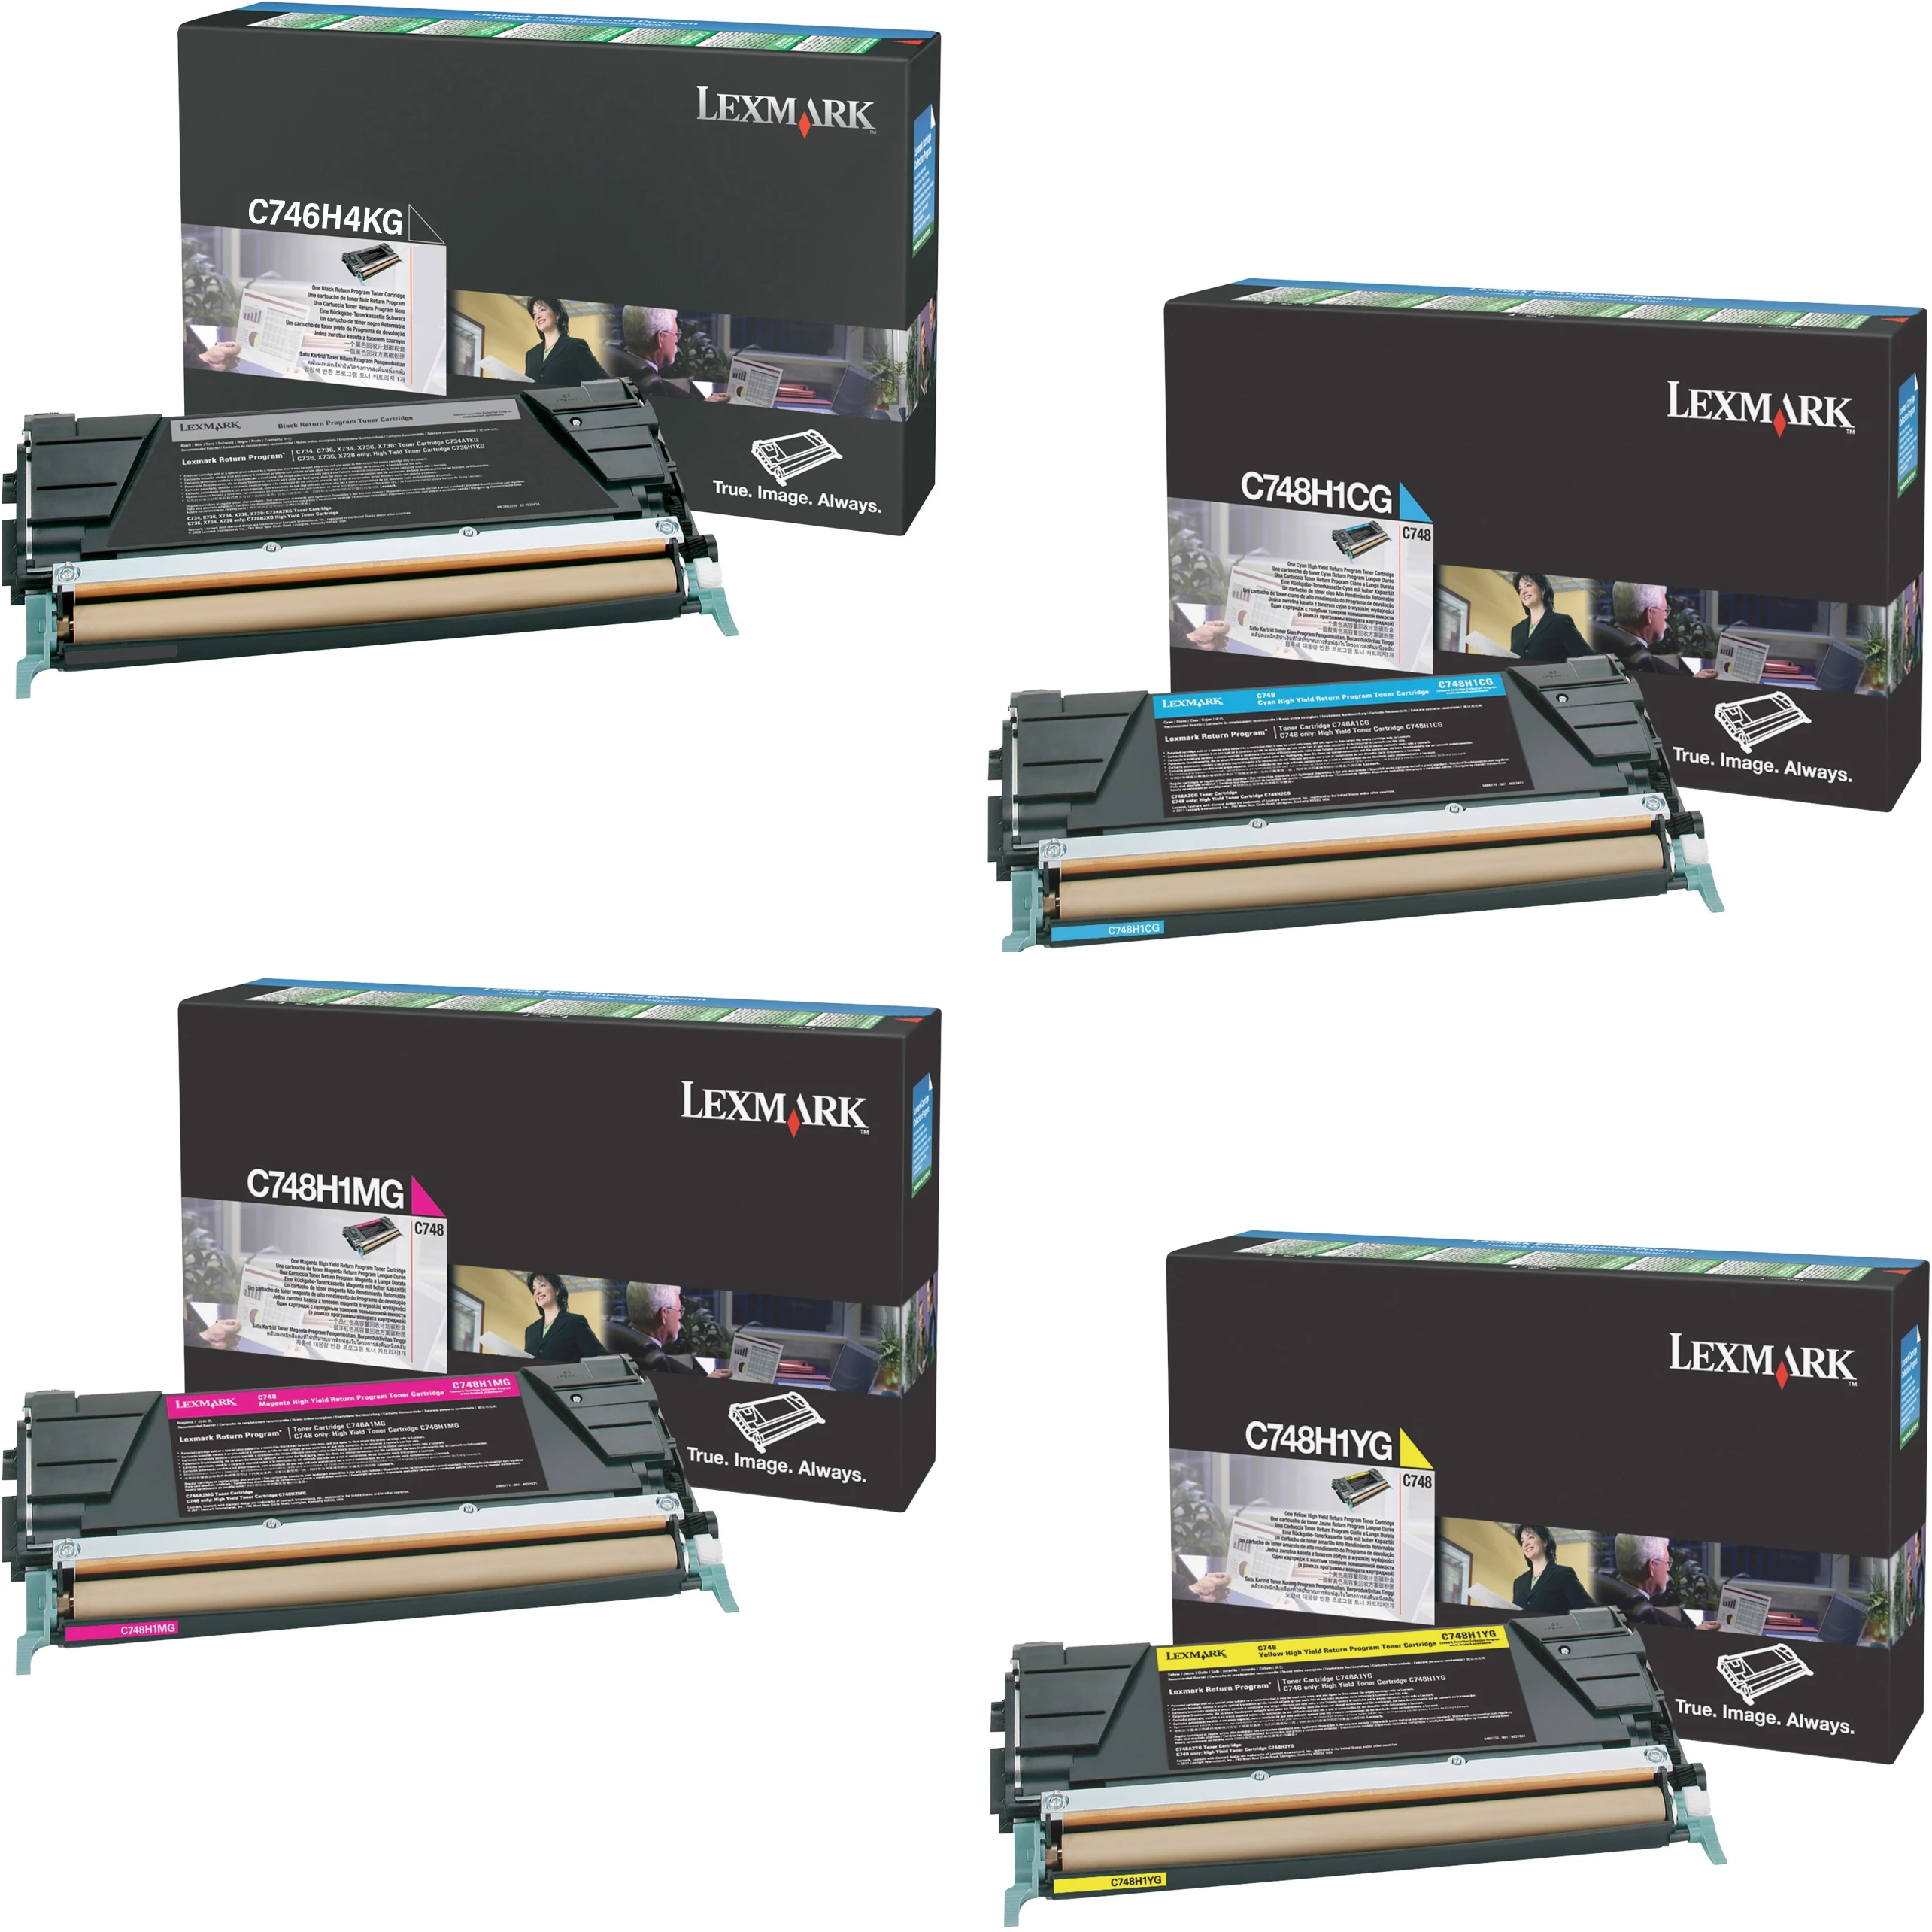 Lexmark C748H1 Set   C746H4KG C748H1CG C748H1MG C748H1YG   Original Lexmark High-Yield Toner Cartridges – Black, Cyan, Magenta, Yellow